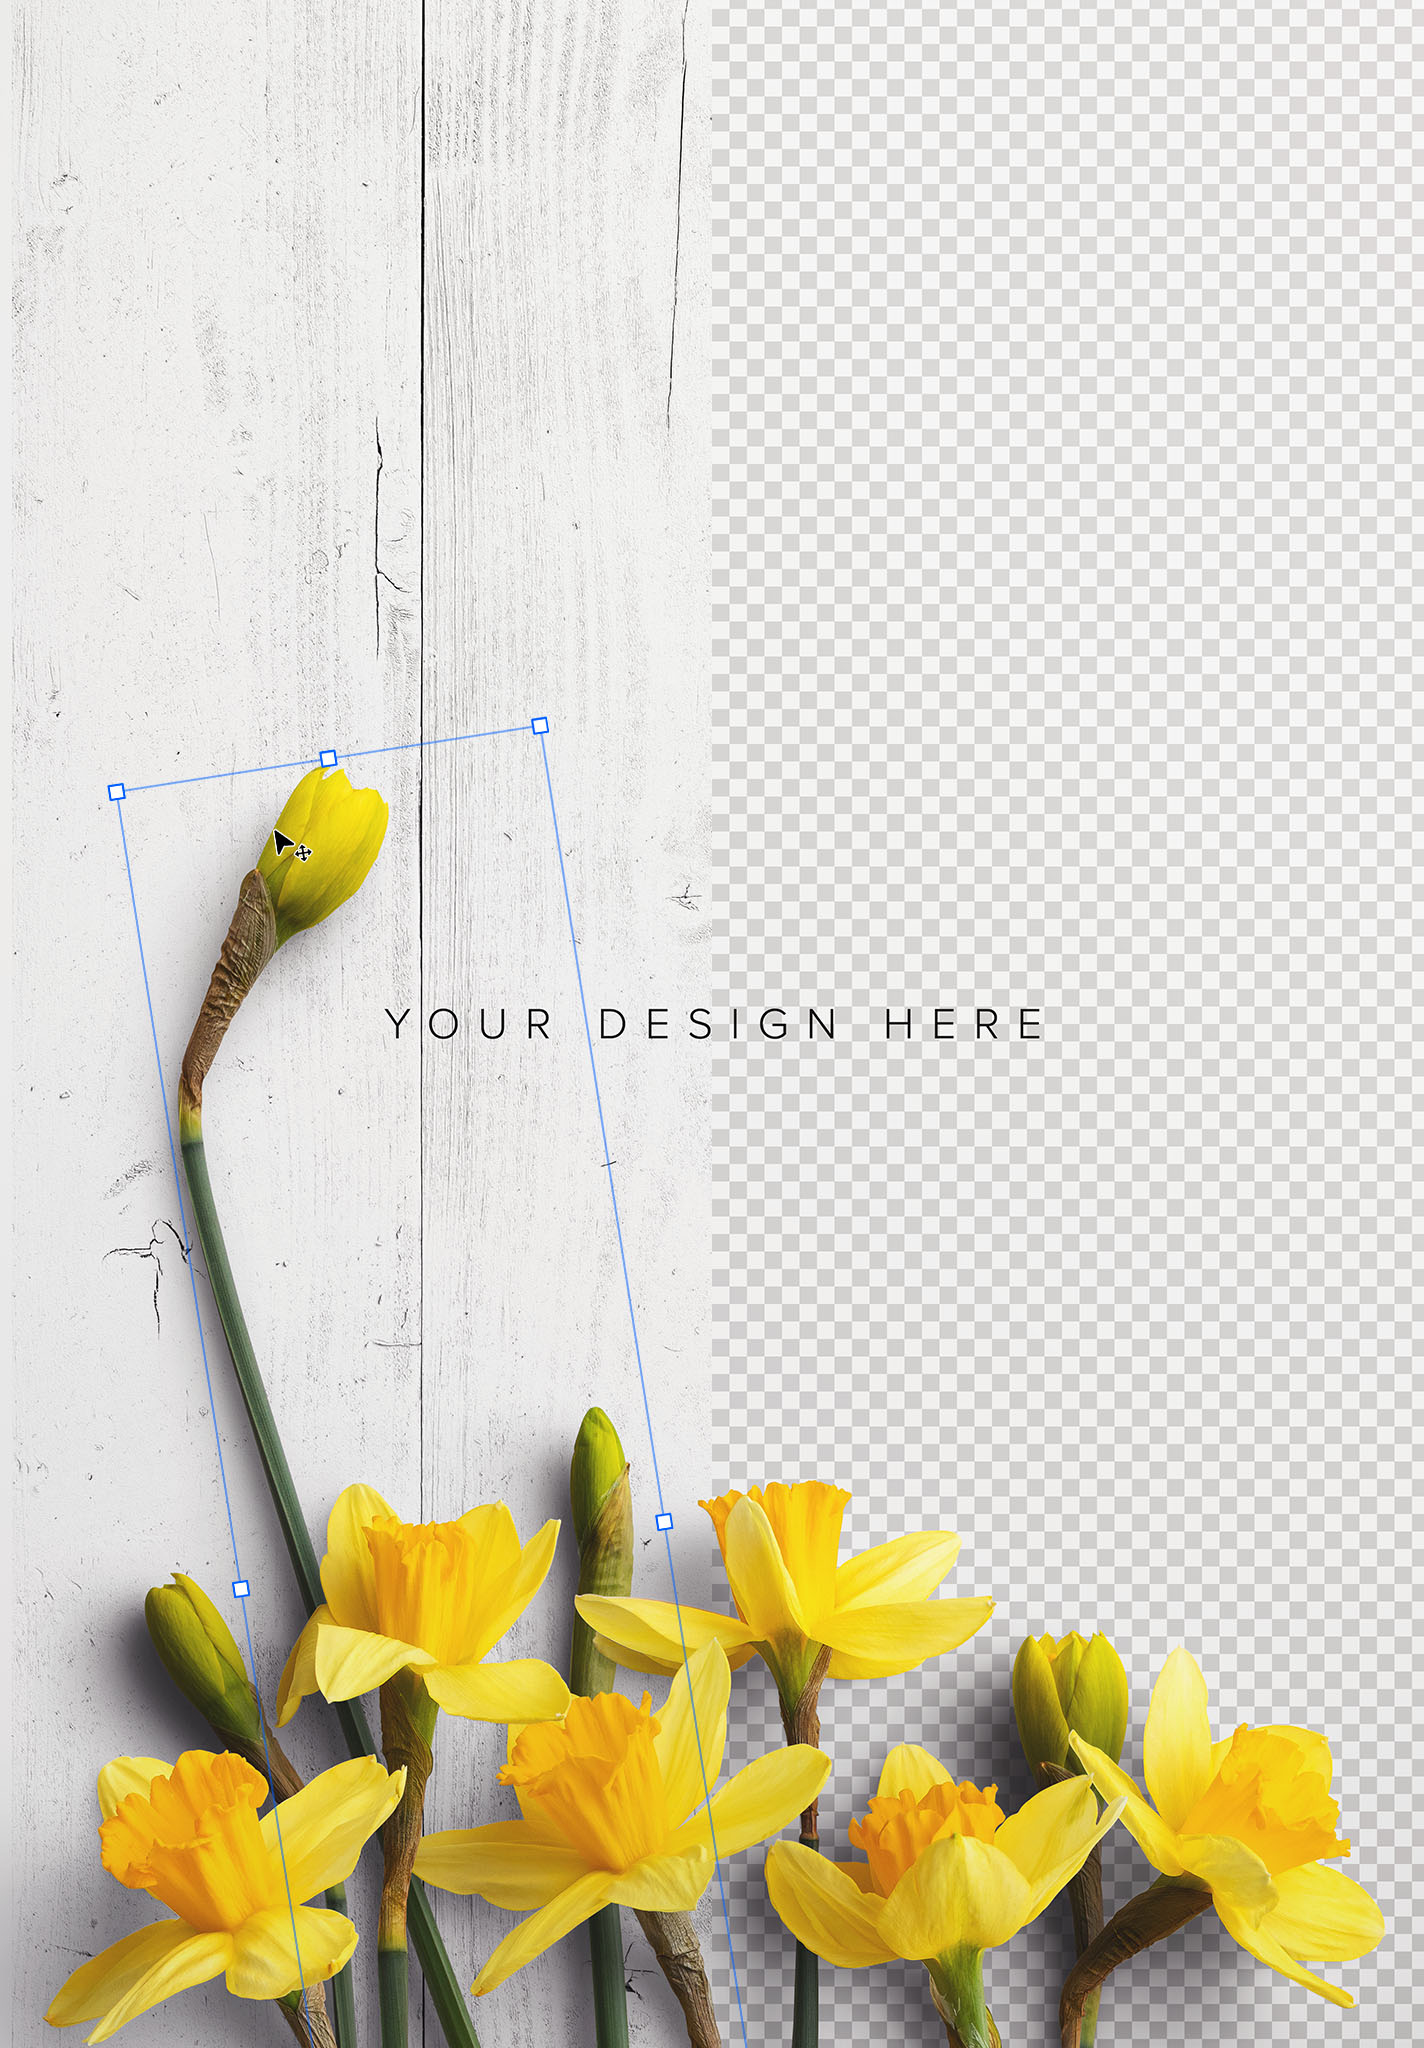 Daffodils Custom Scene Creator Template 6 Image01